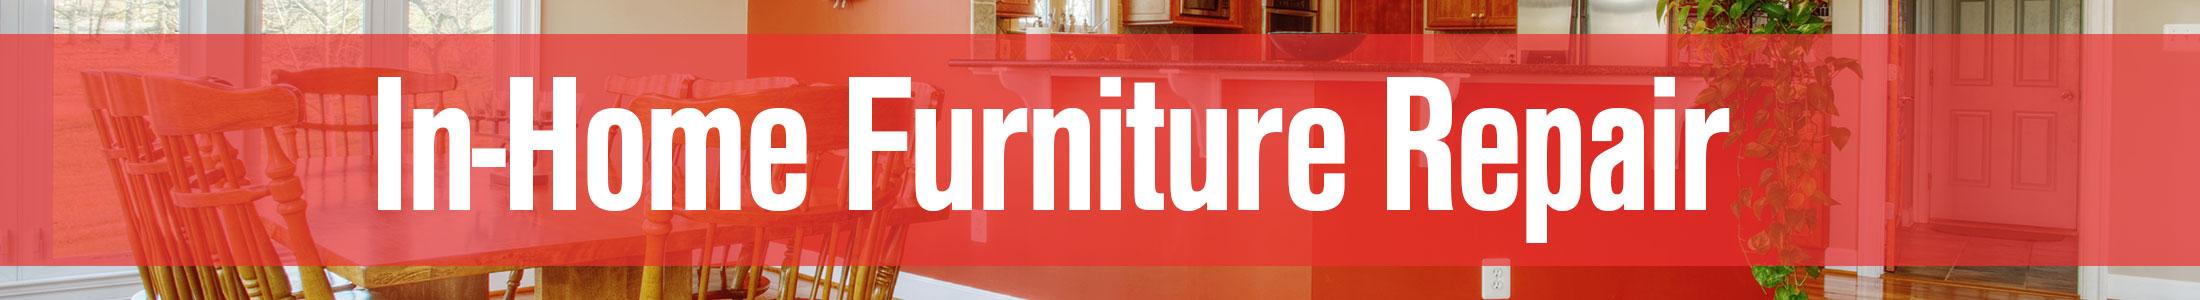 Captivating In Home Furniture Repair